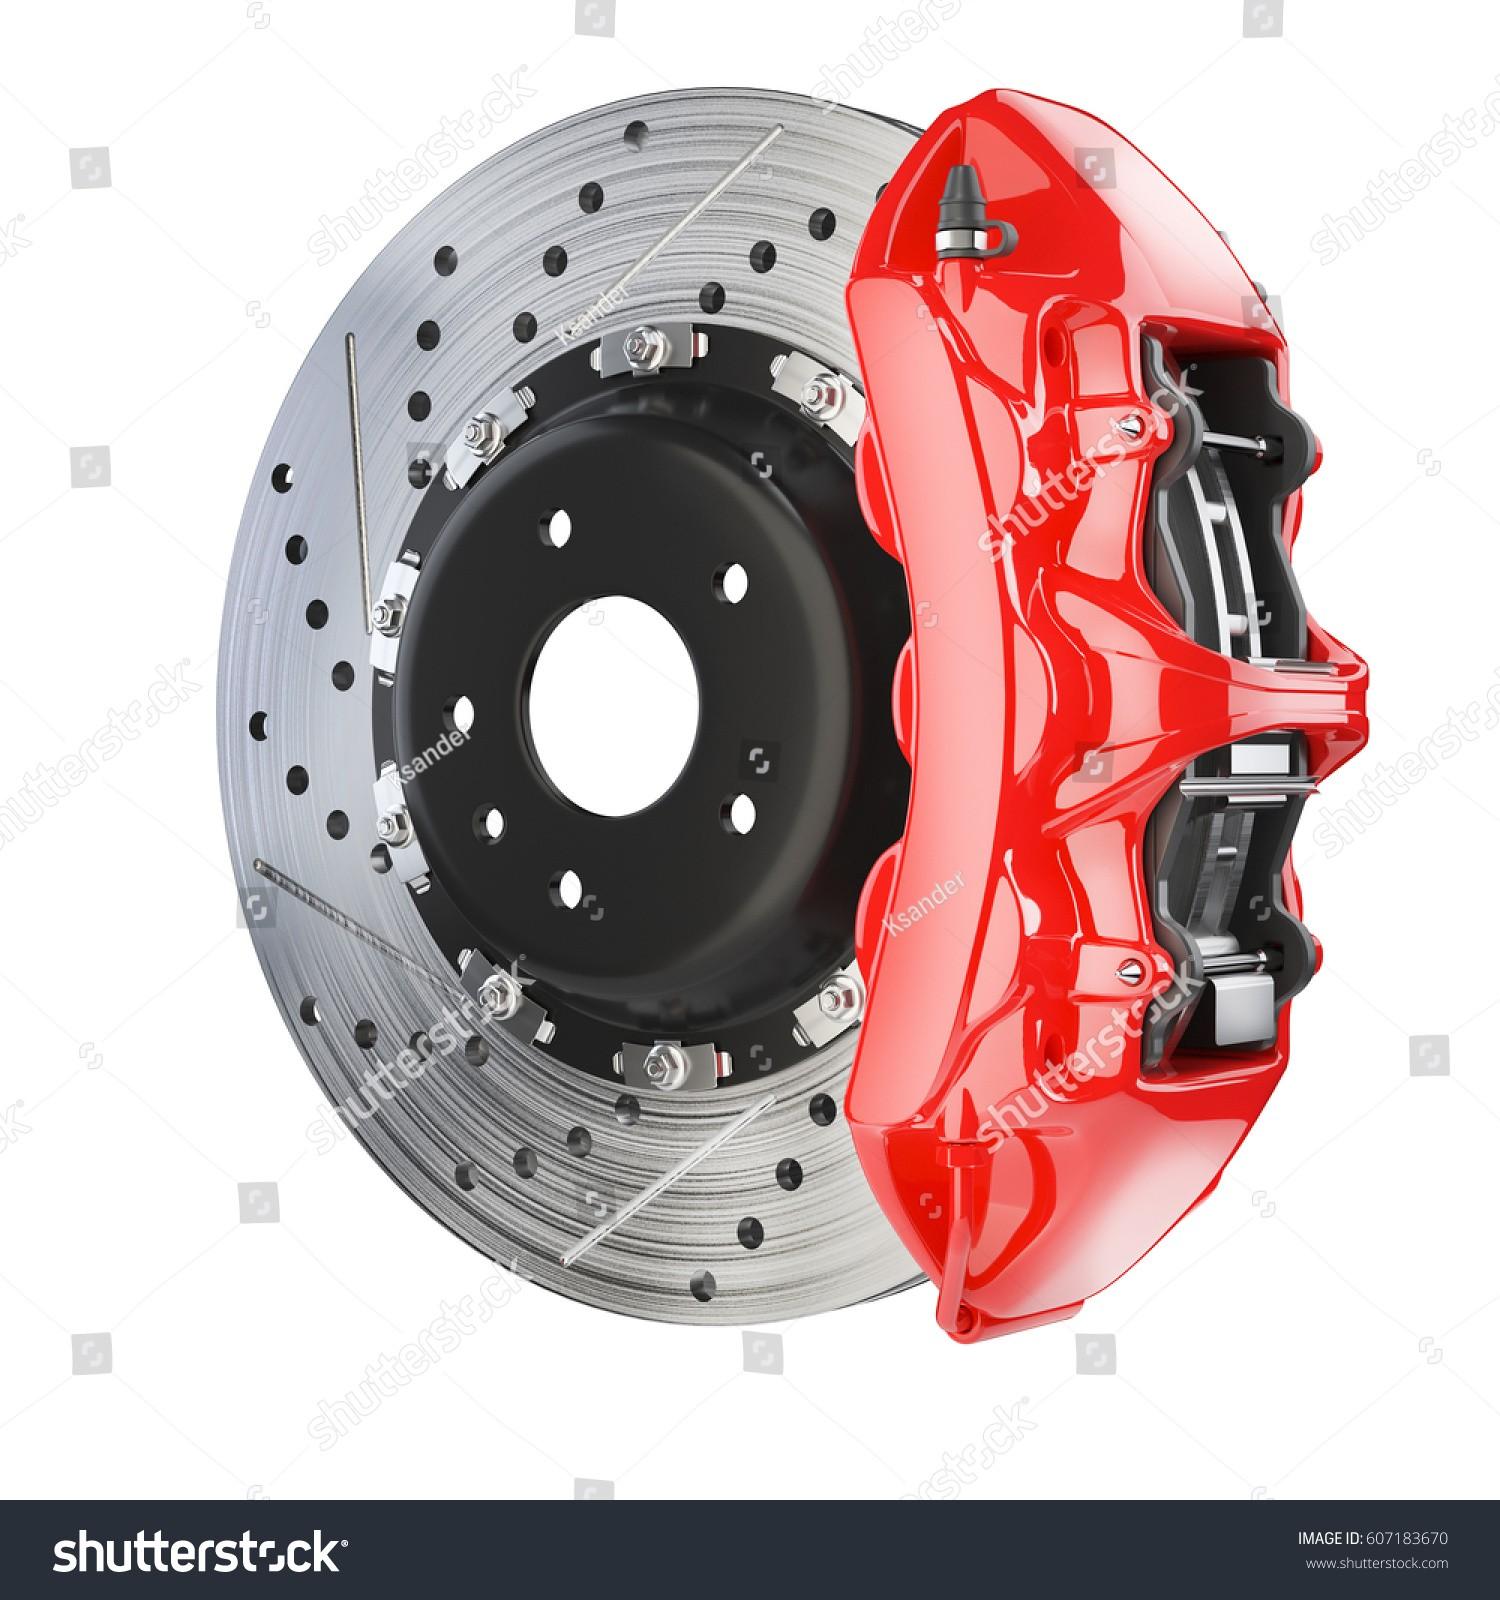 Disc Brake Schematic Diagram Brake Disk Red Caliper Brakes System Stock Illustration Of Disc Brake Schematic Diagram